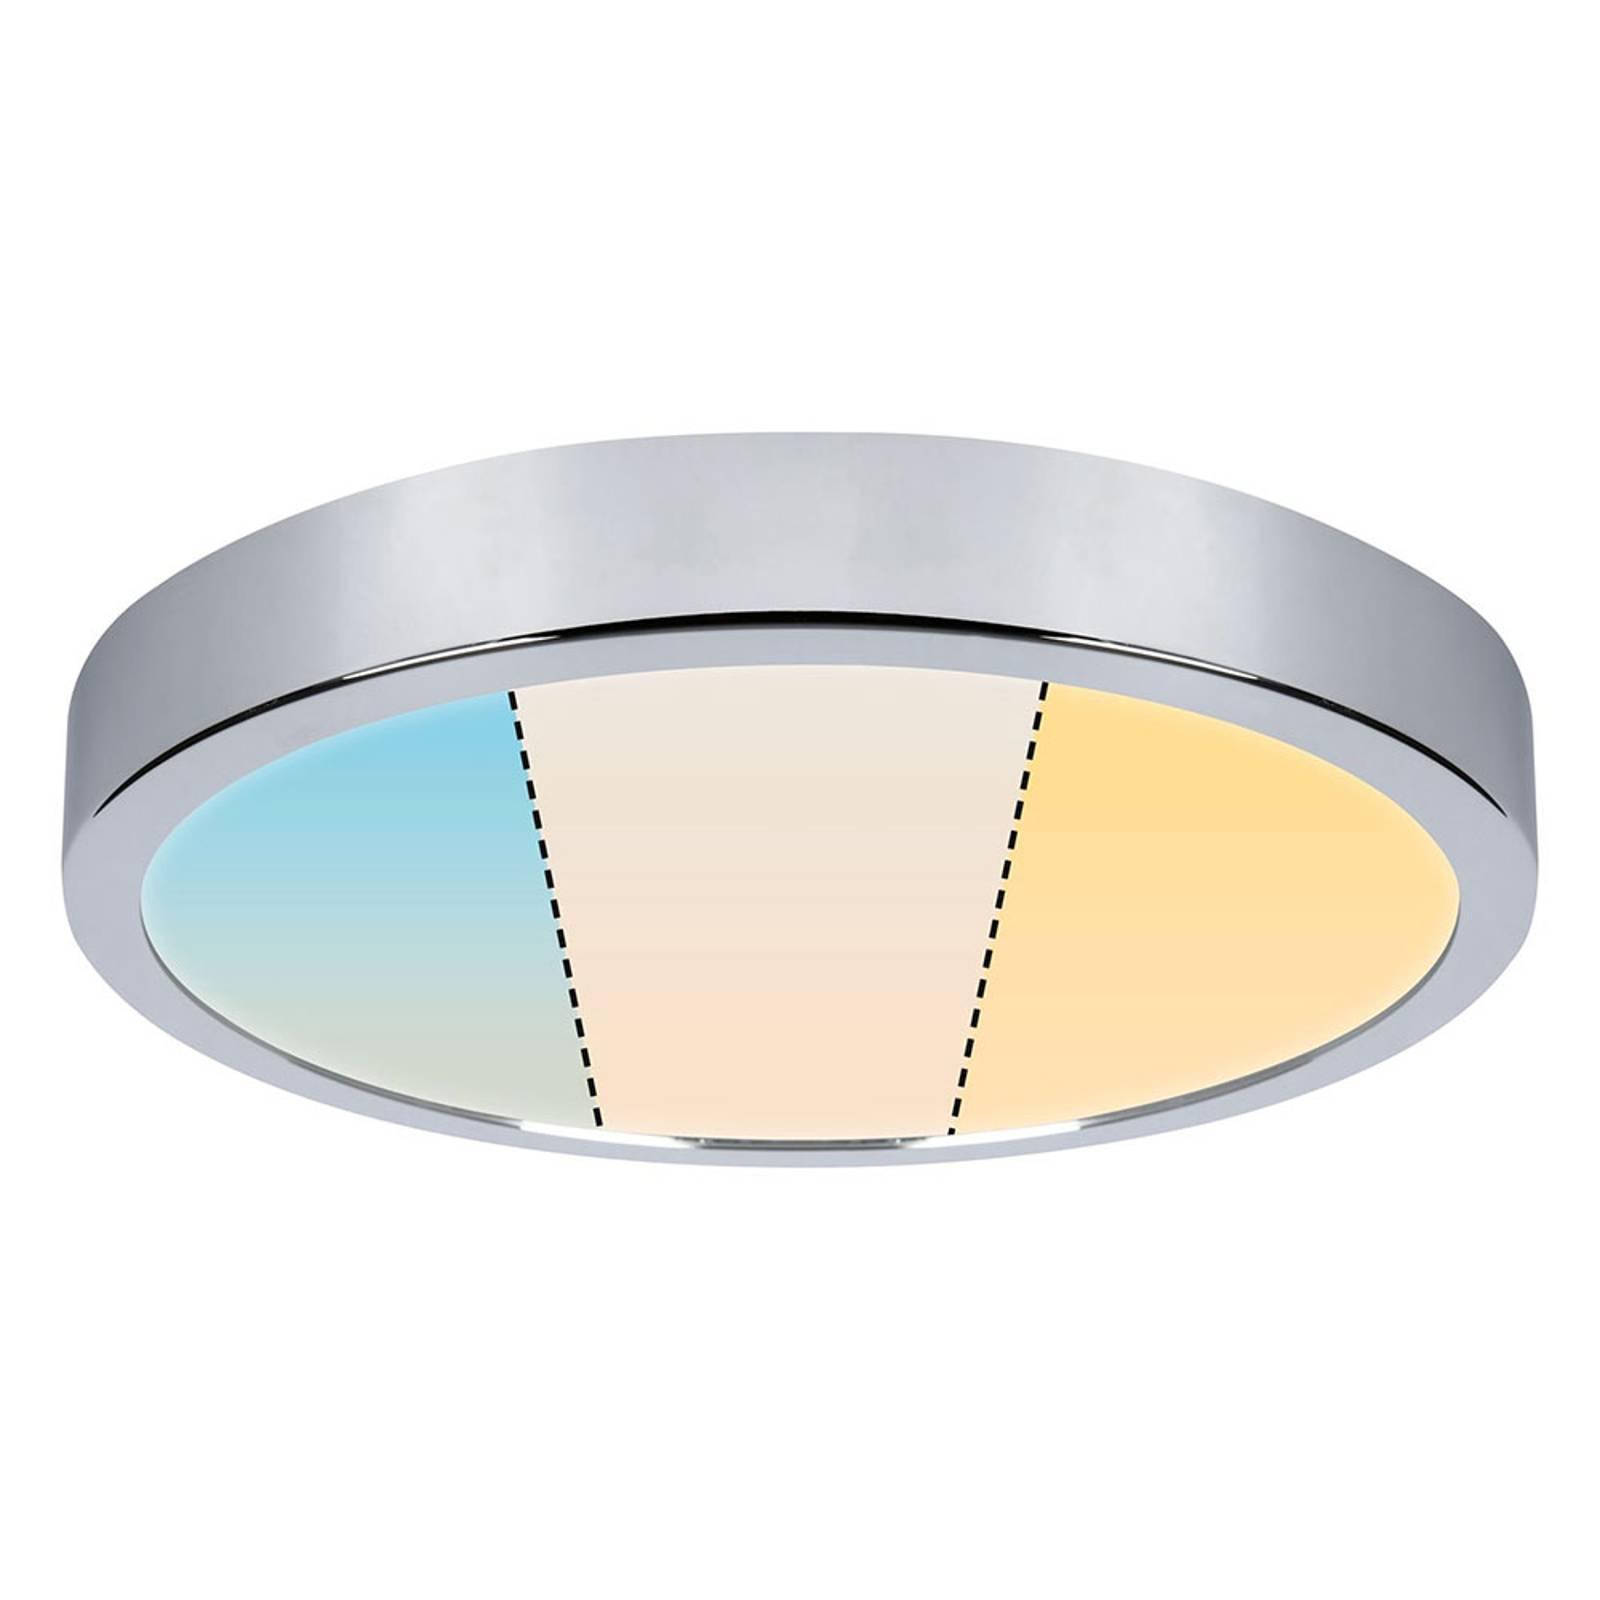 Paulmann Aviar -LED-kattolamppu WhiteSwitch Ø 30cm